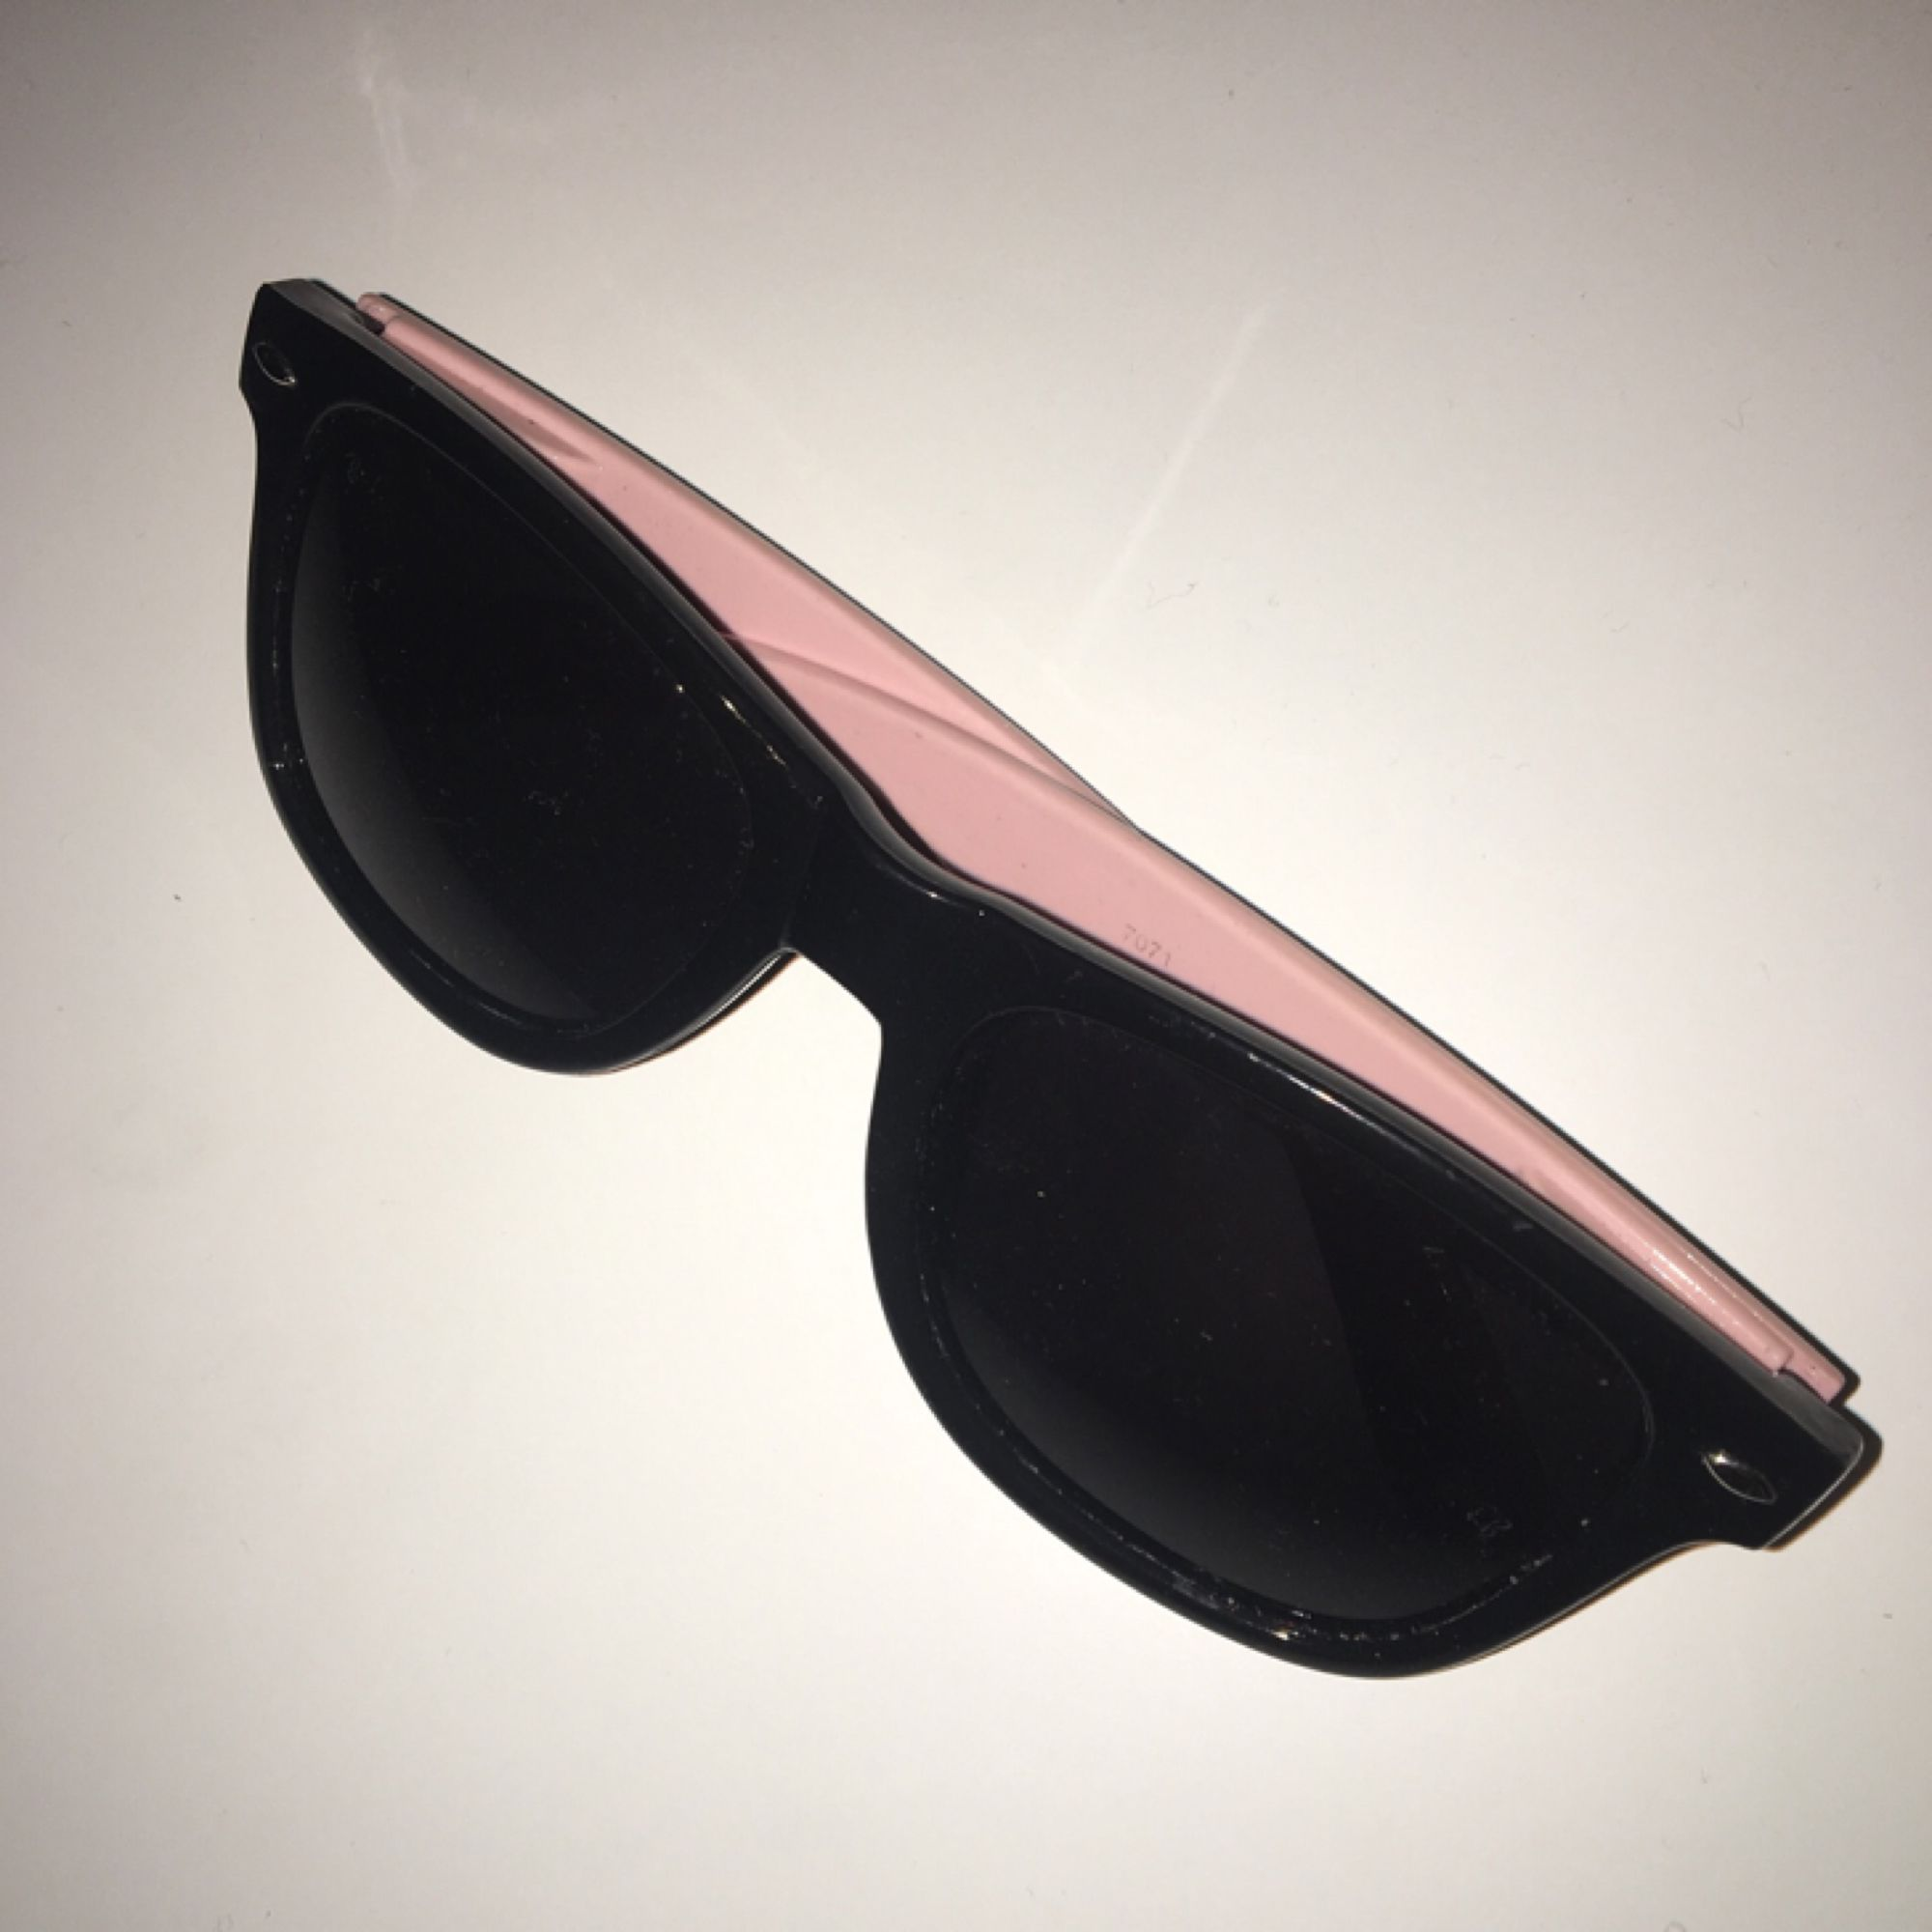 Coola solglasögon i svart   rosa. Fint skick. Frakt ingår. Accessoarer. 8e163568c9826